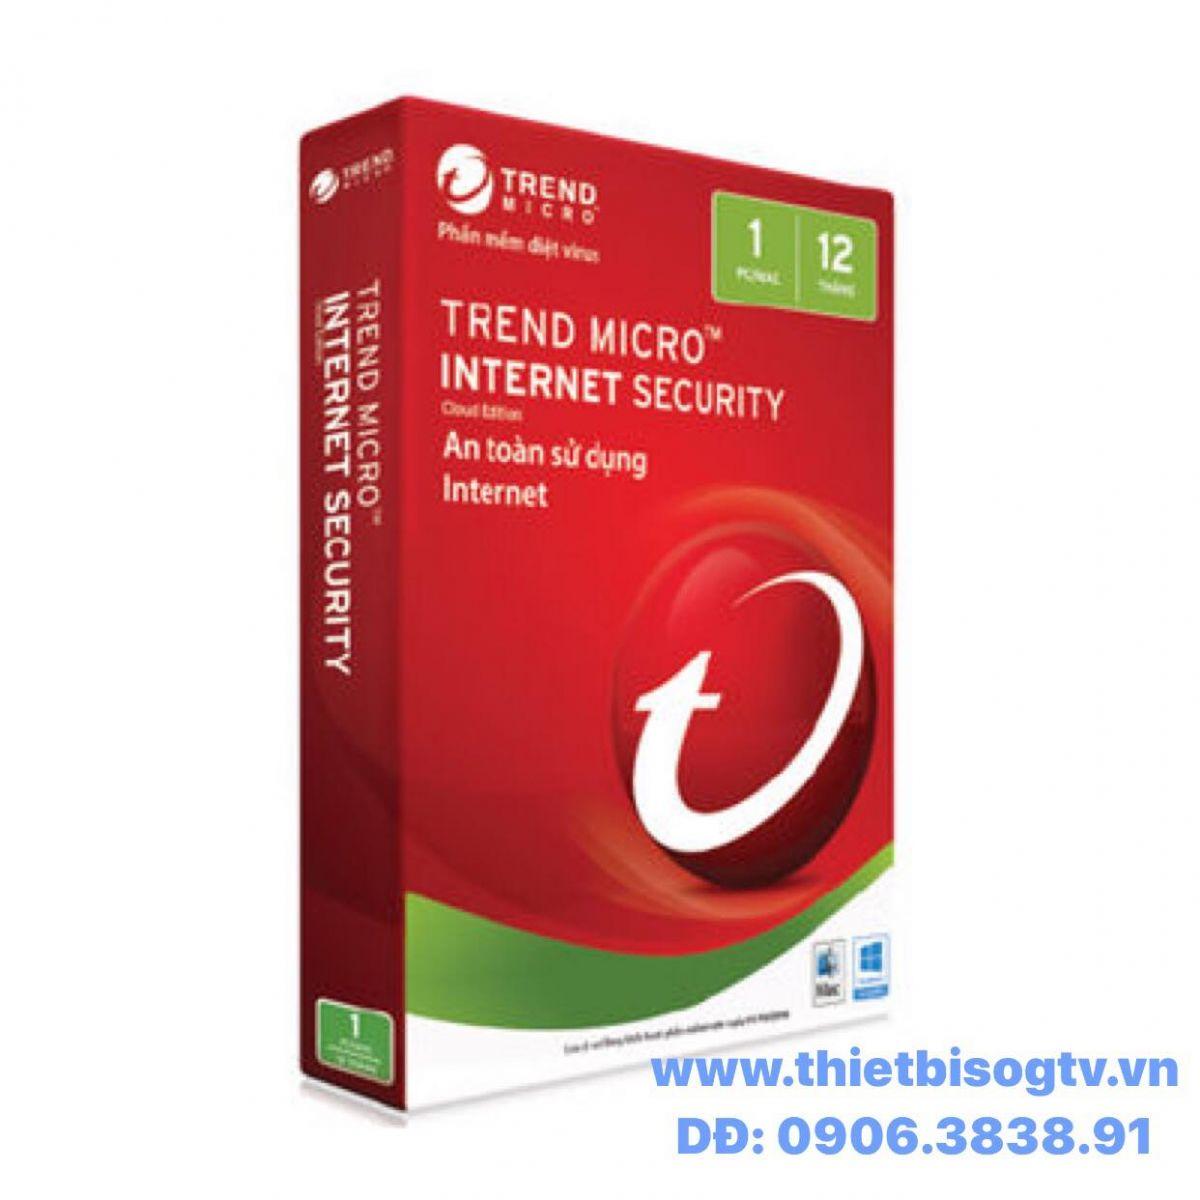 PHẦN MỀM DIỆT VIRUS TREND MICRO INTERNET SECURITY 2018 1PC